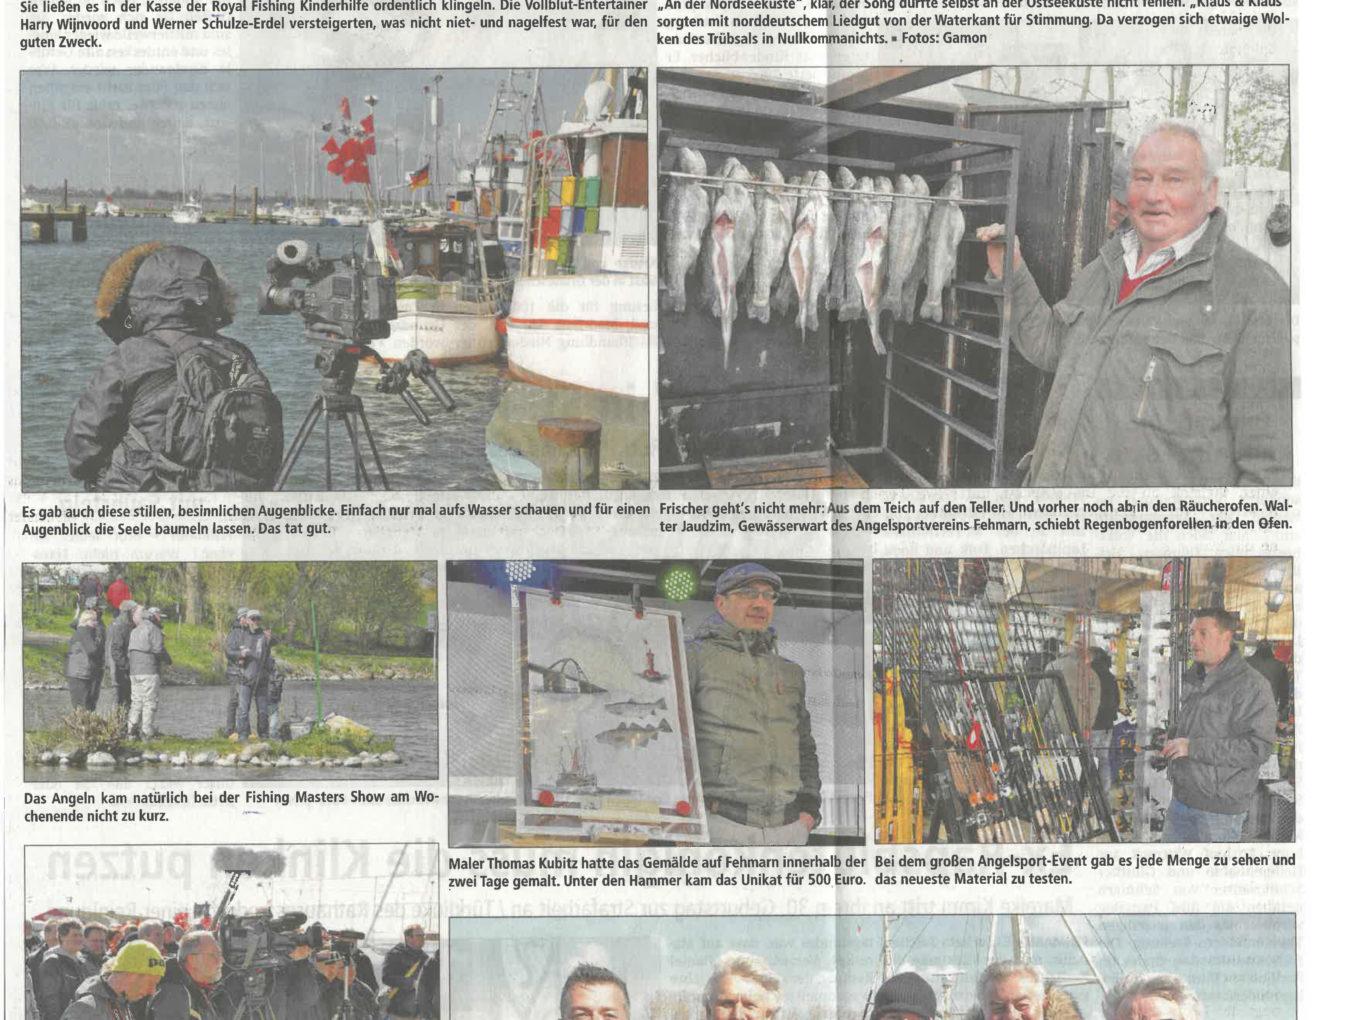 Fishing Masters Show in Bildern